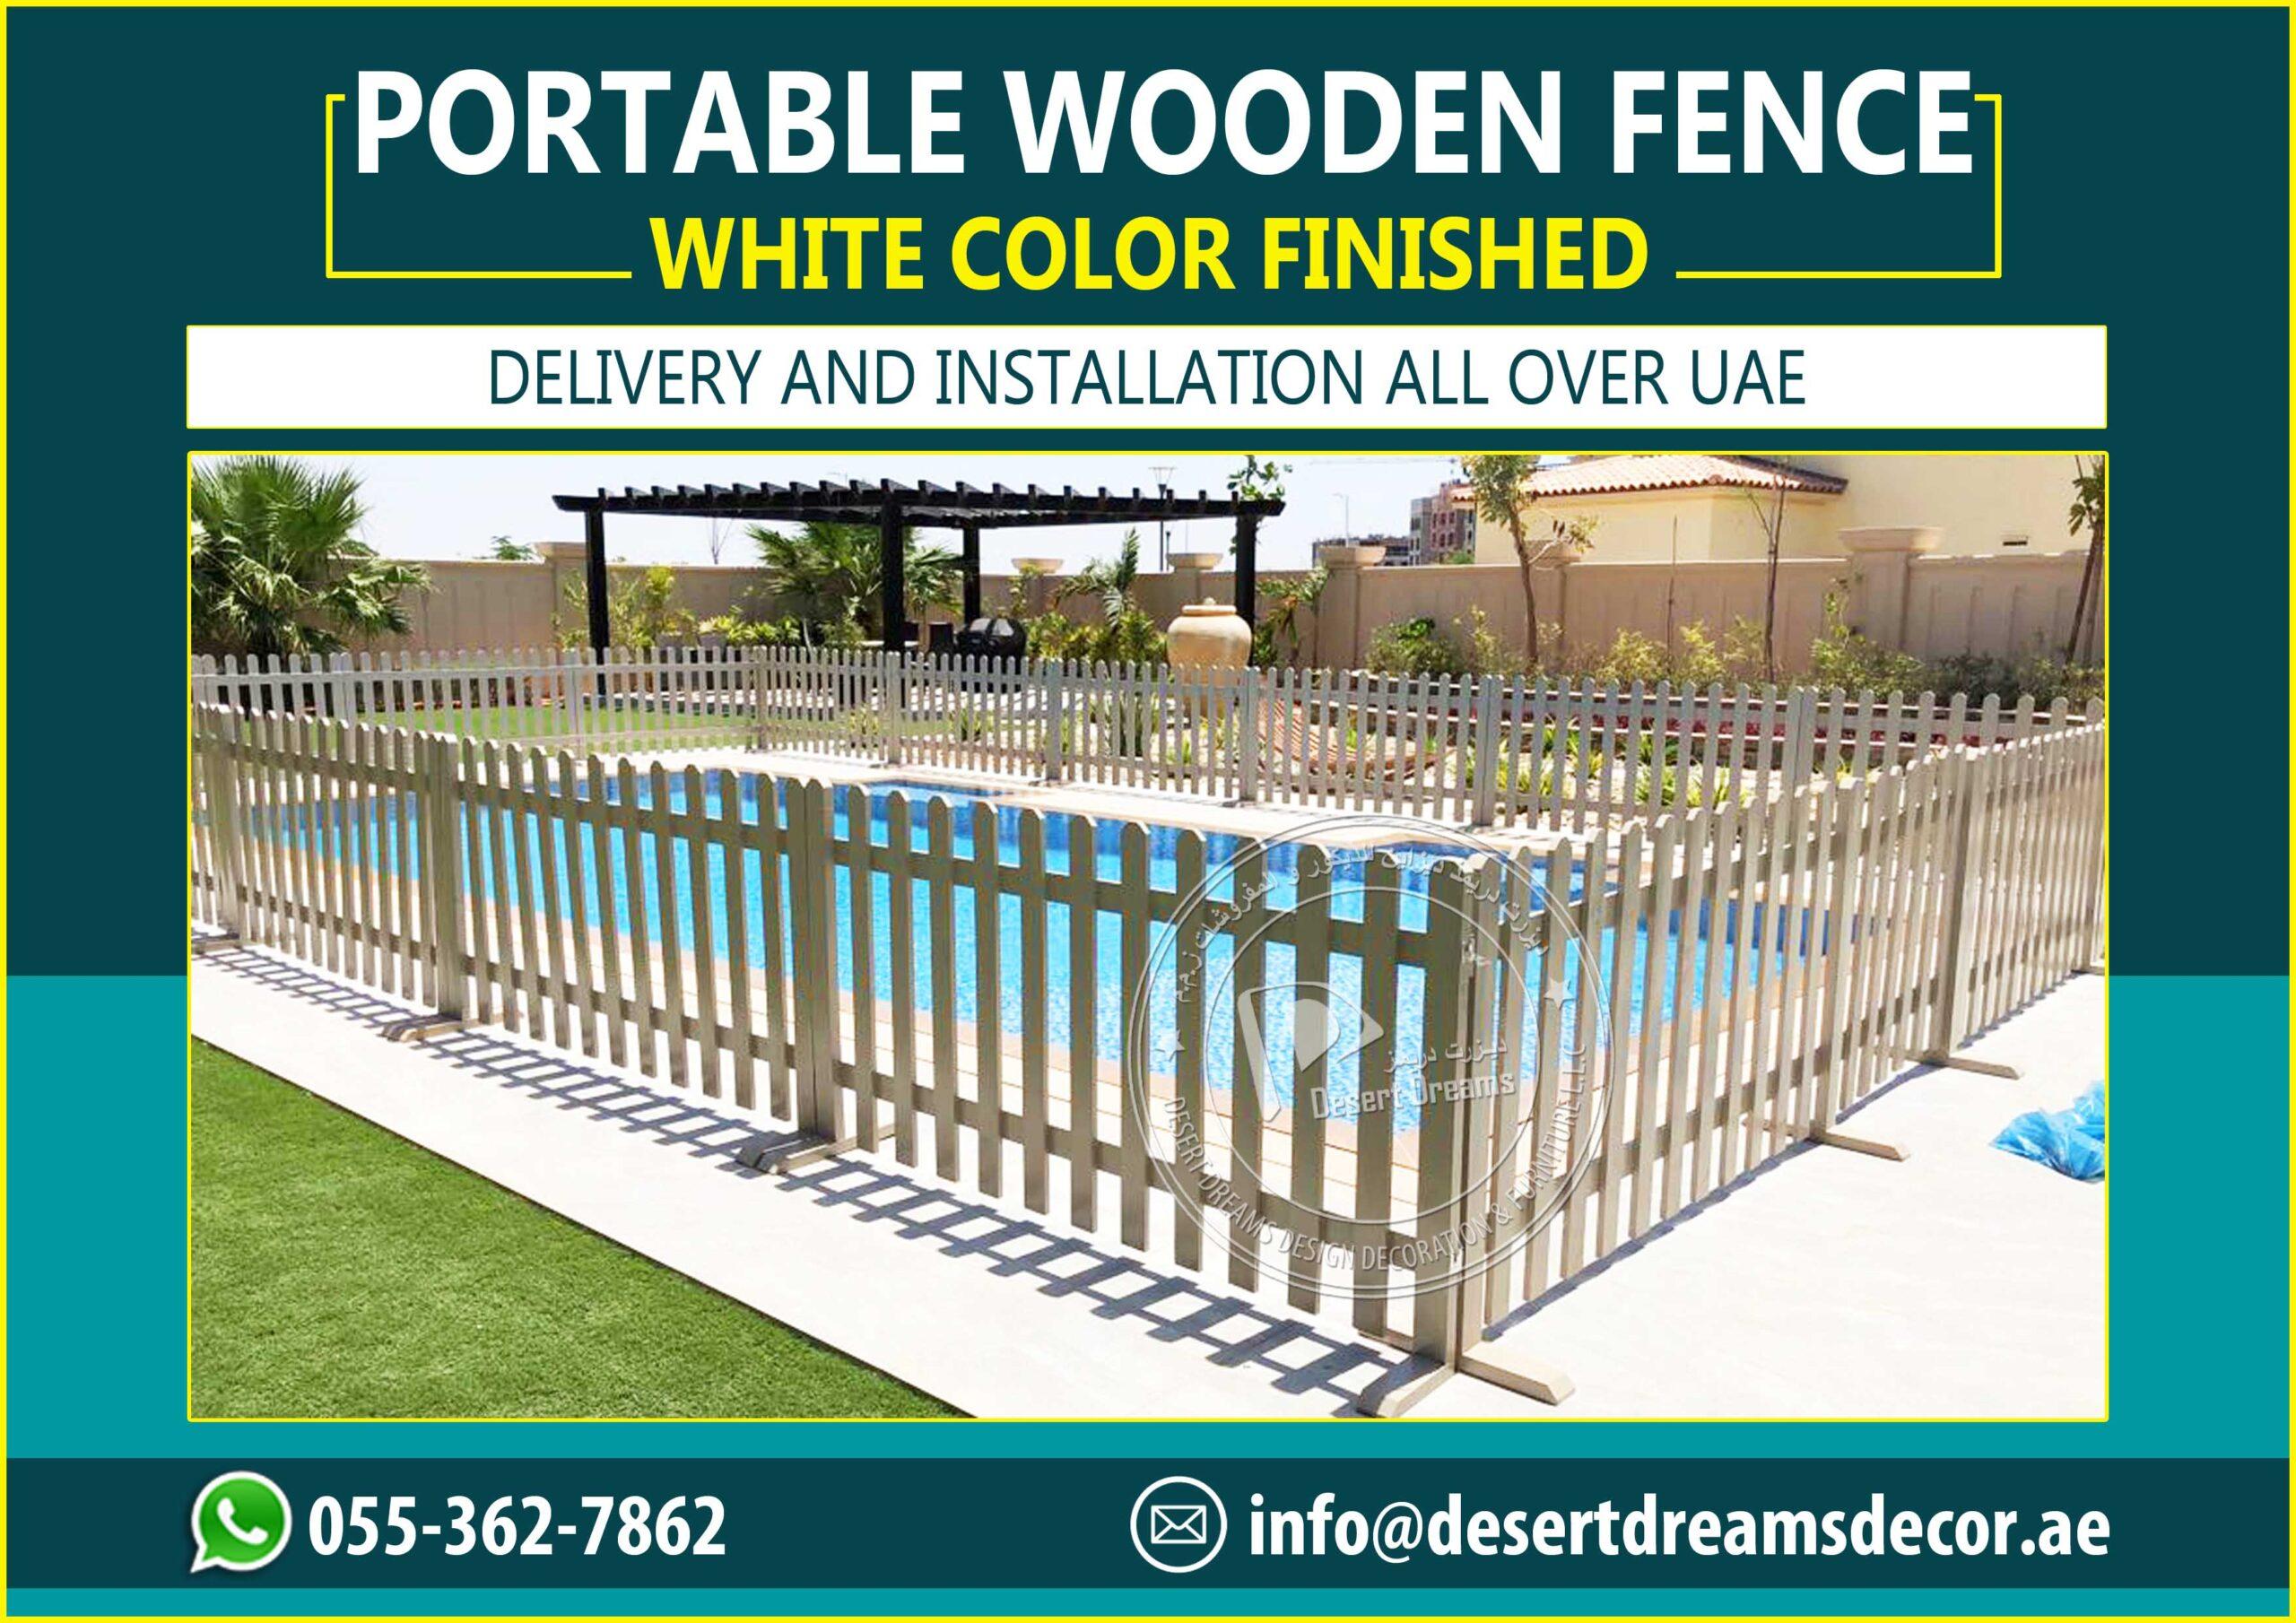 Portable Wooden Fences Suppliers in UAE_Desert Dreams Decor (5).jpg